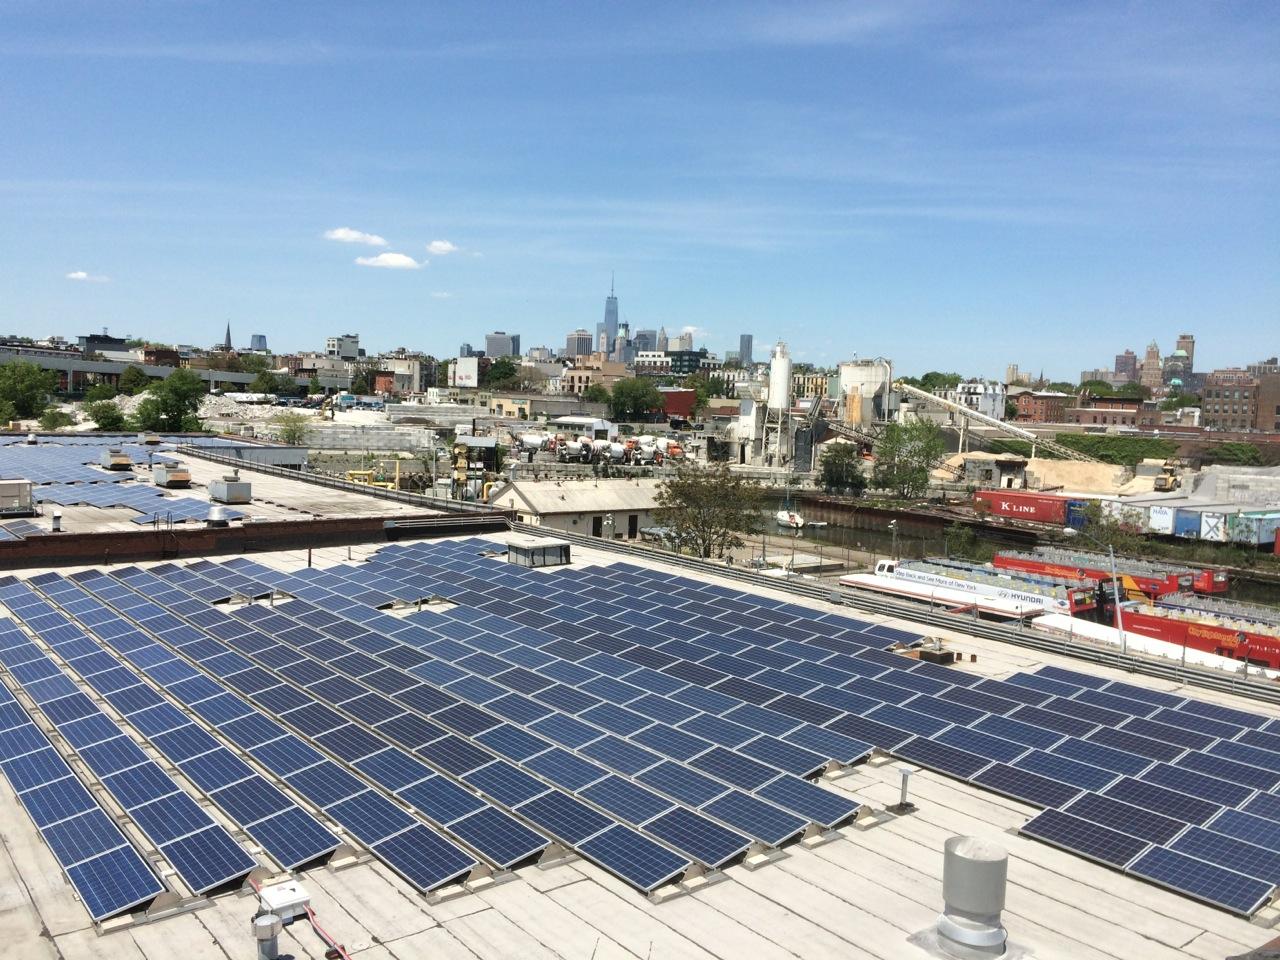 Solar panel installation in Brooklyn (LO3 image)